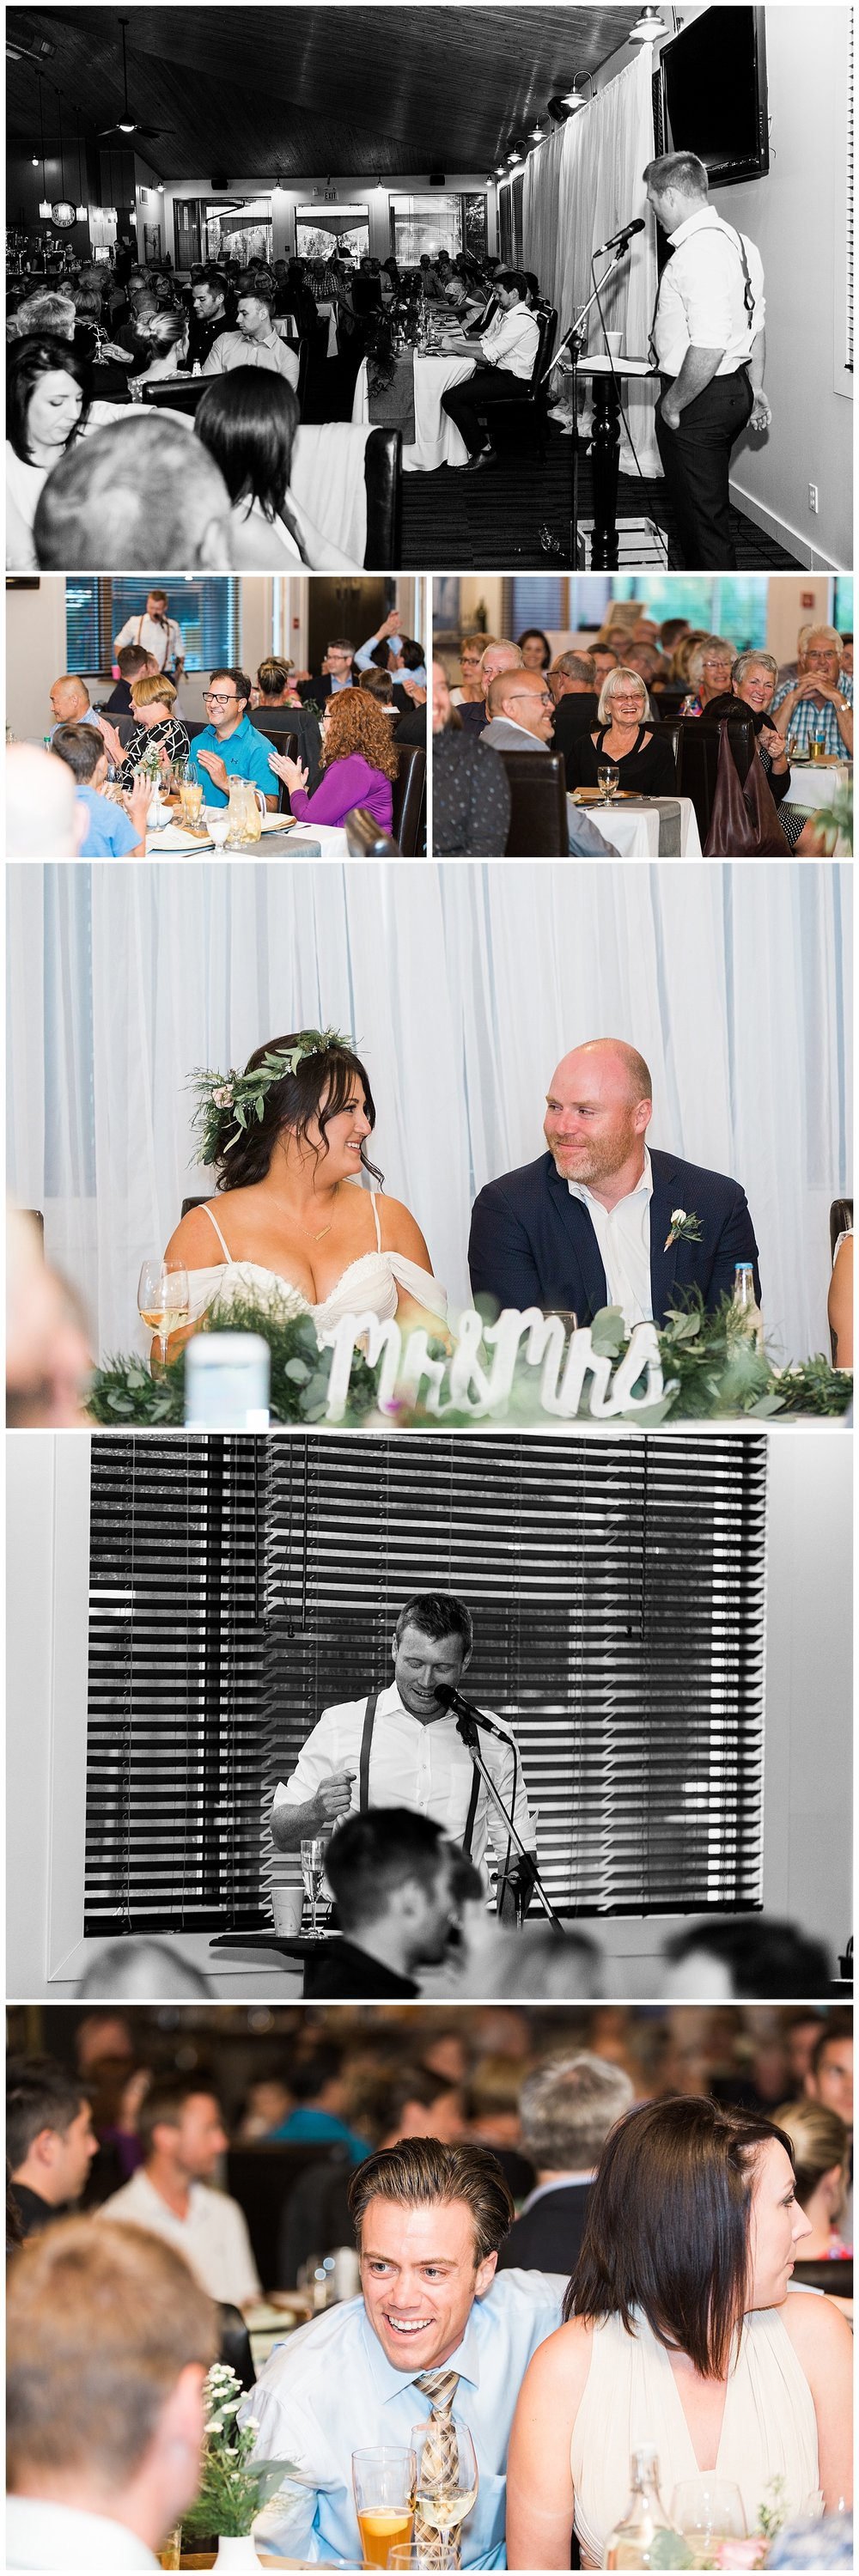 Calgary-wedding-photographer-springbank-links-golf-course-_0023.jpg